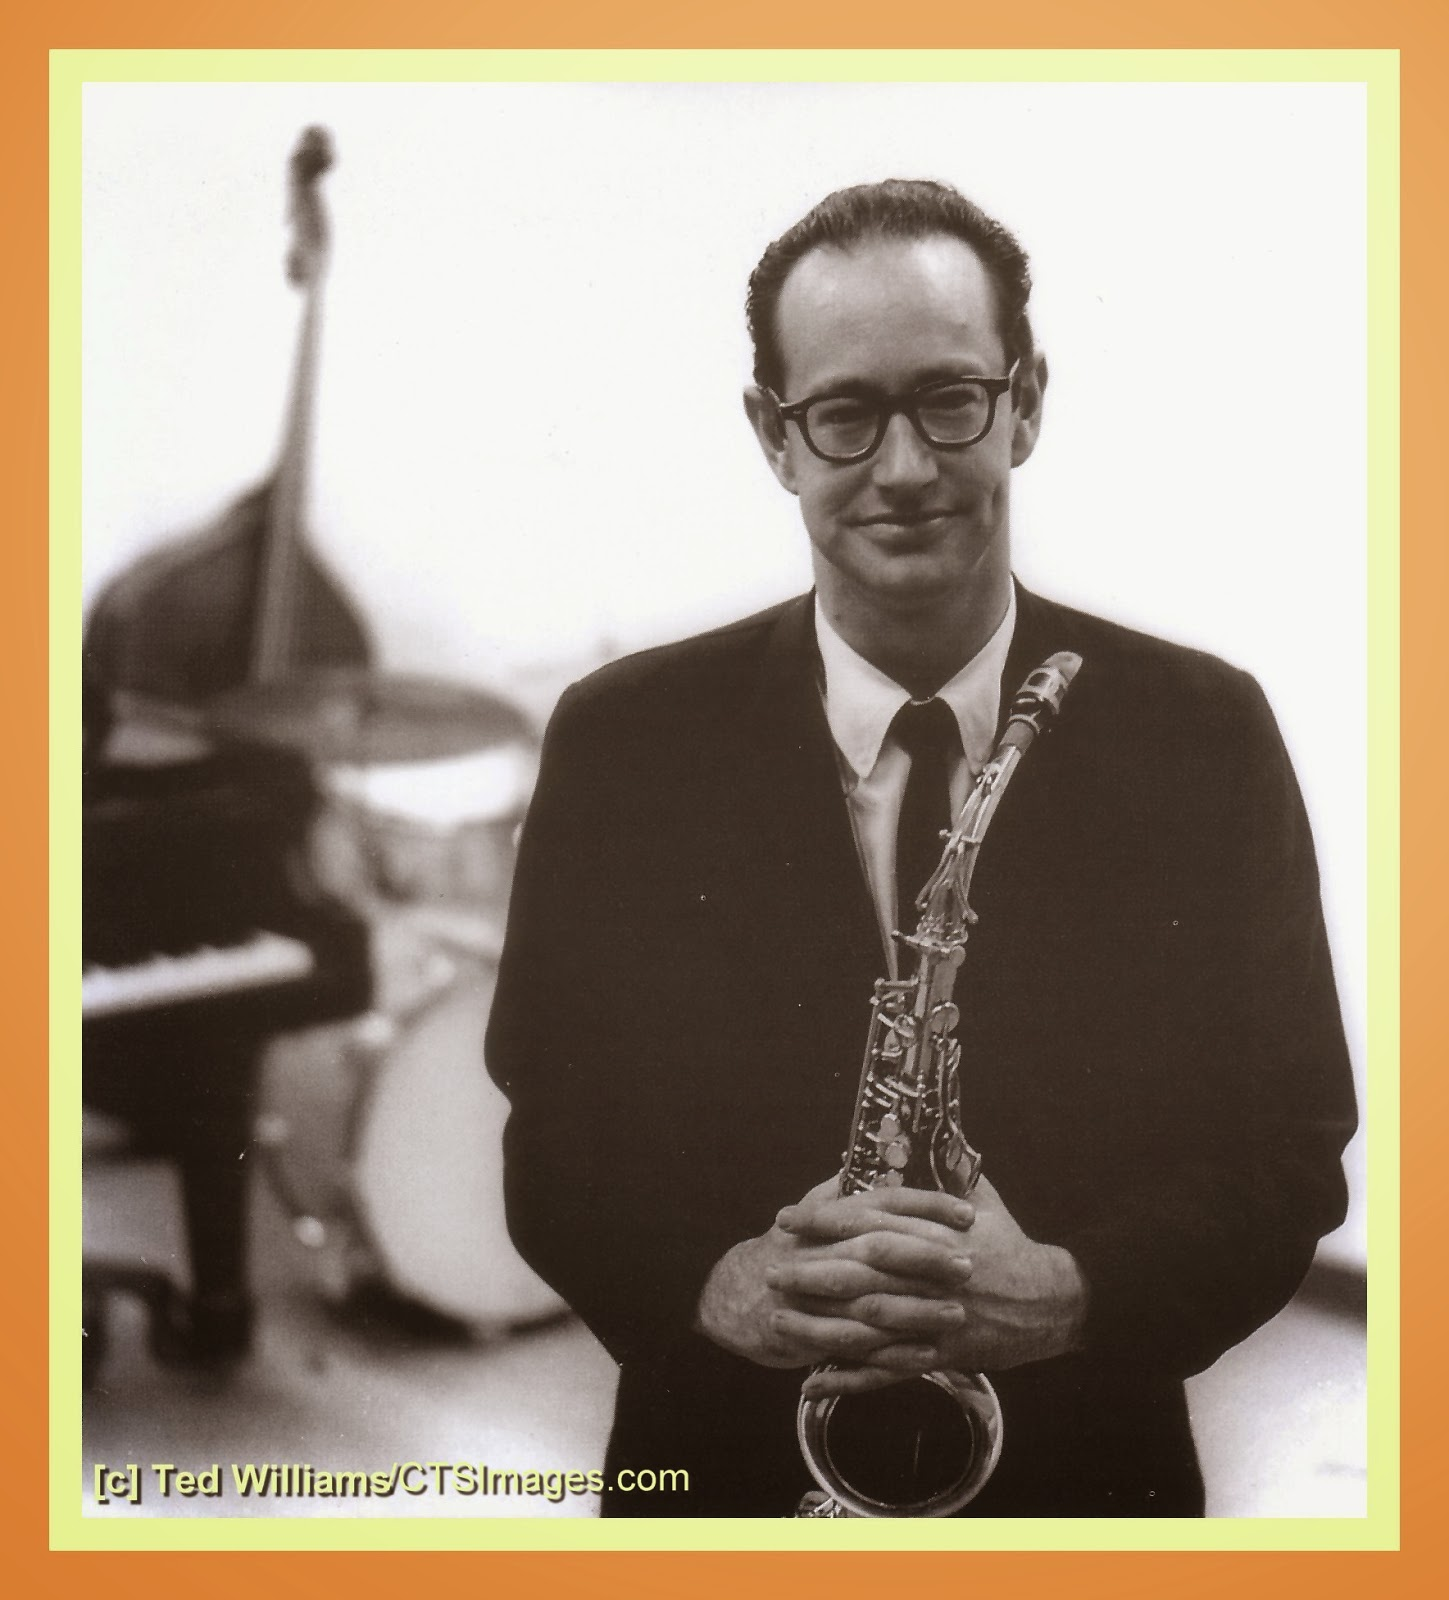 Dave Brubeck Octet, The* Dave Brubeck Octet - Prelude / Fugue On Bop Themes